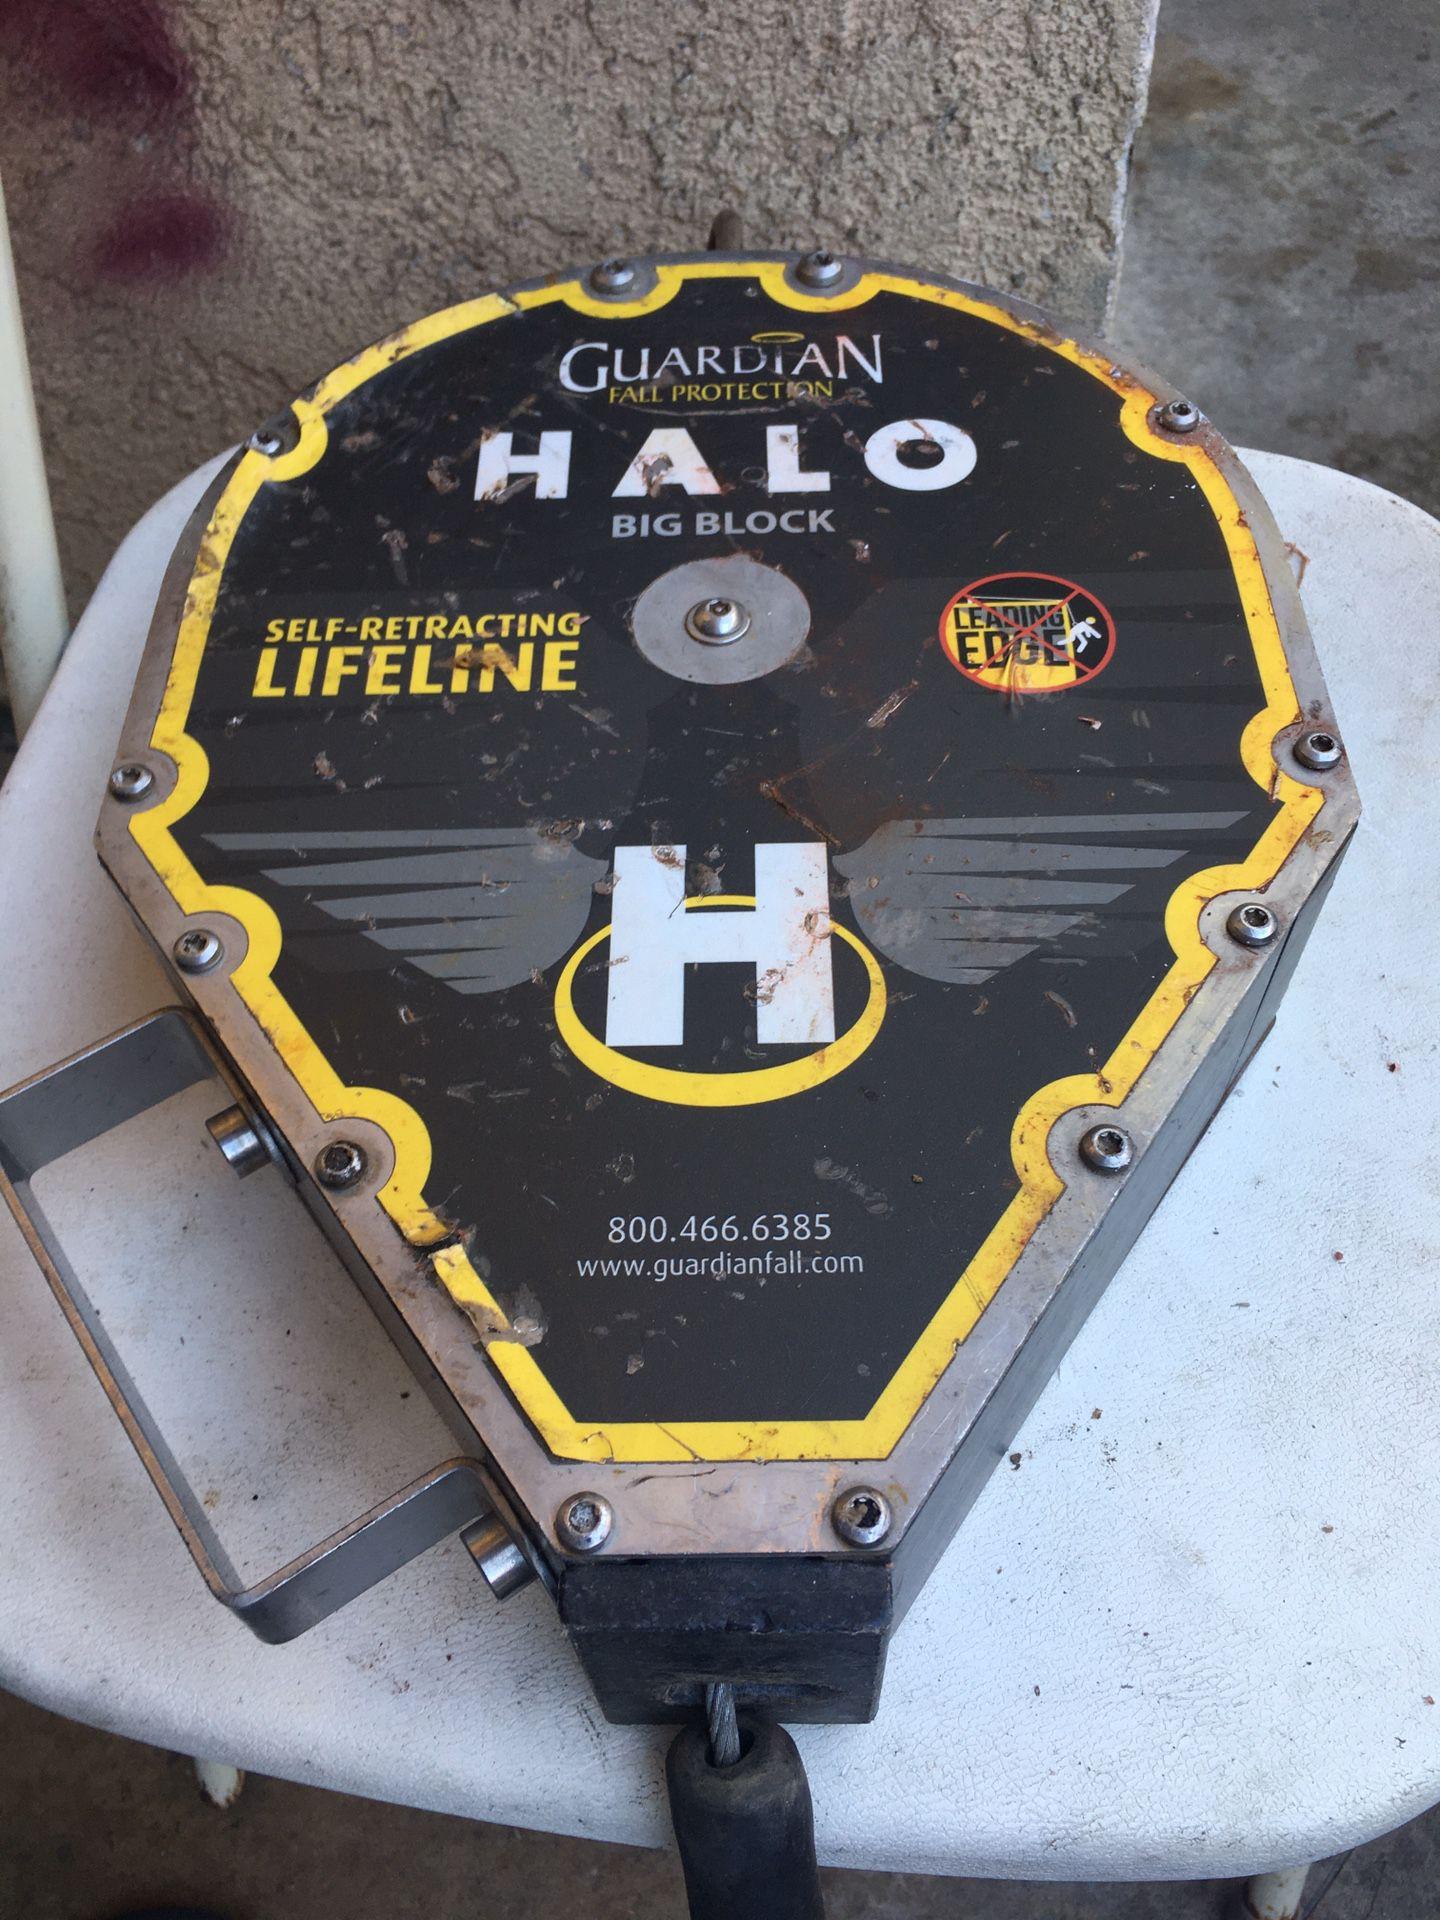 guardian halo big block